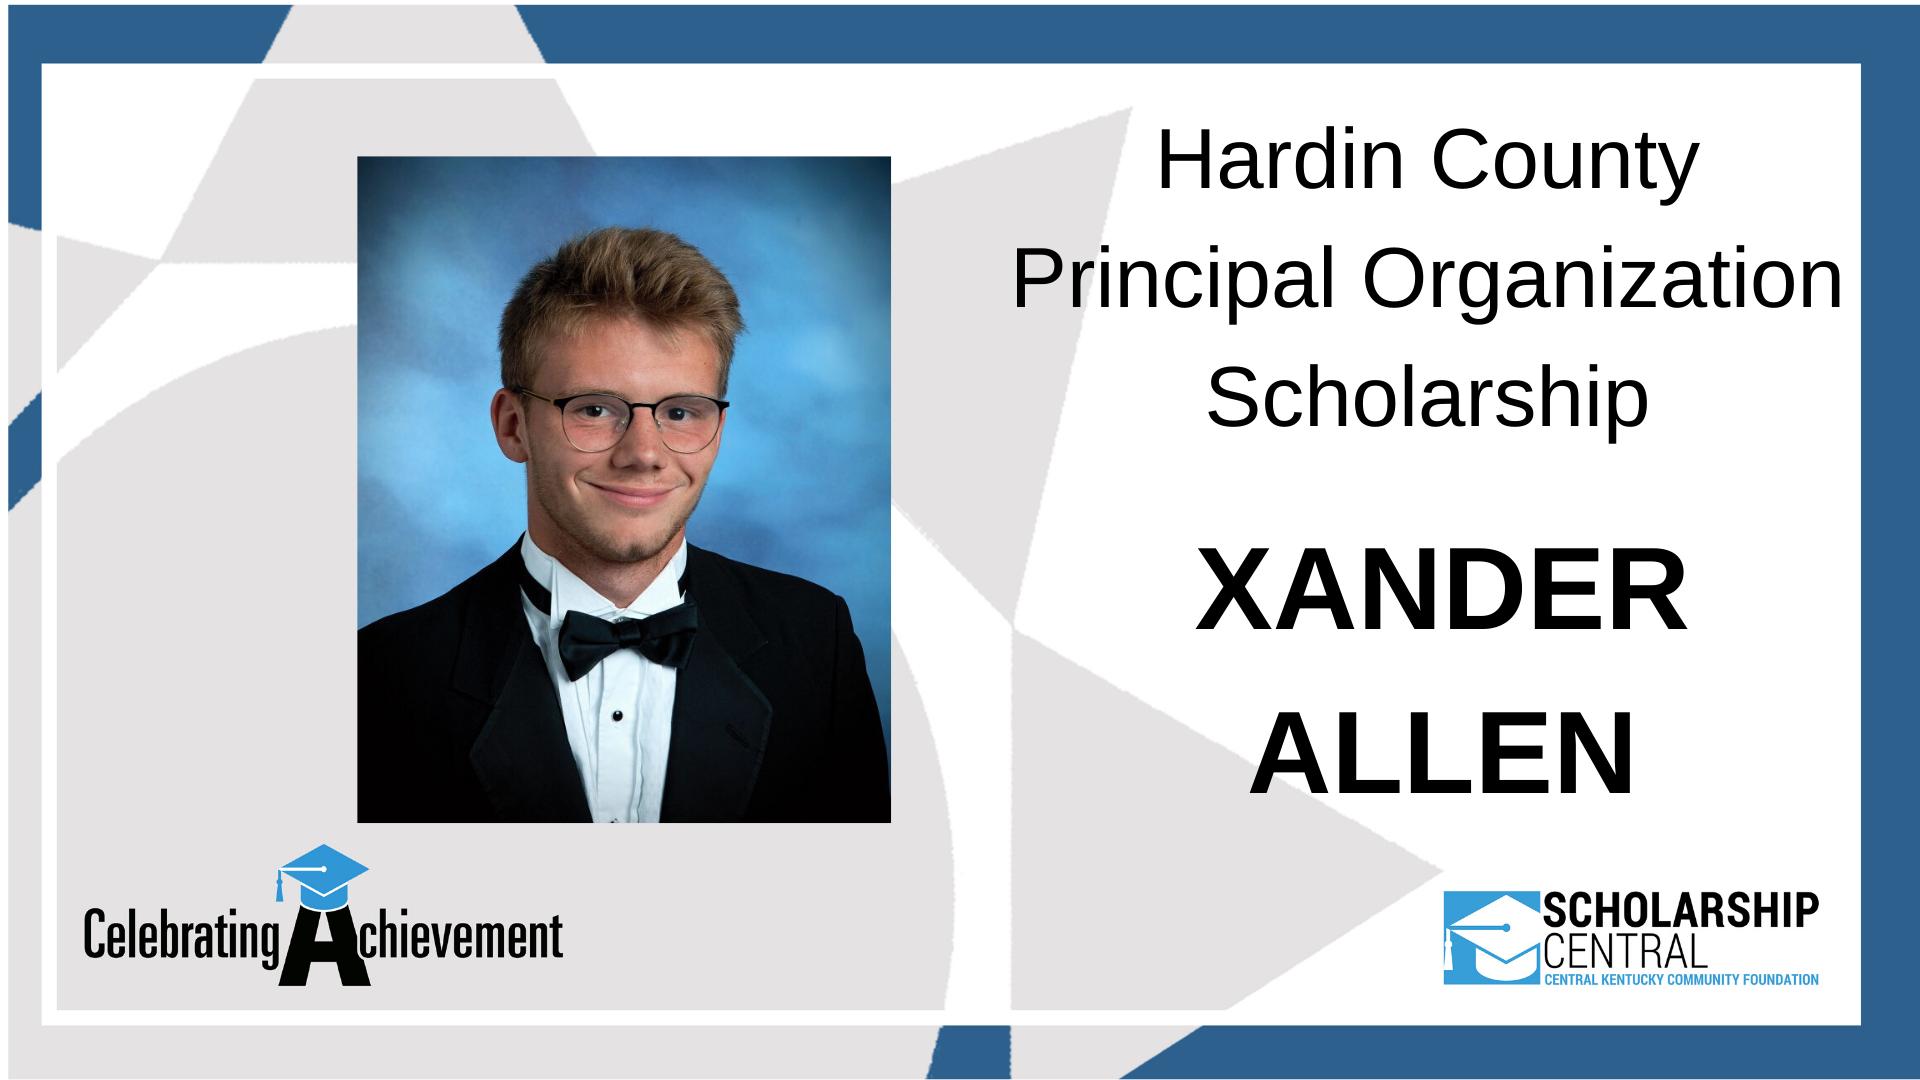 Hardin County Principal Scholarship